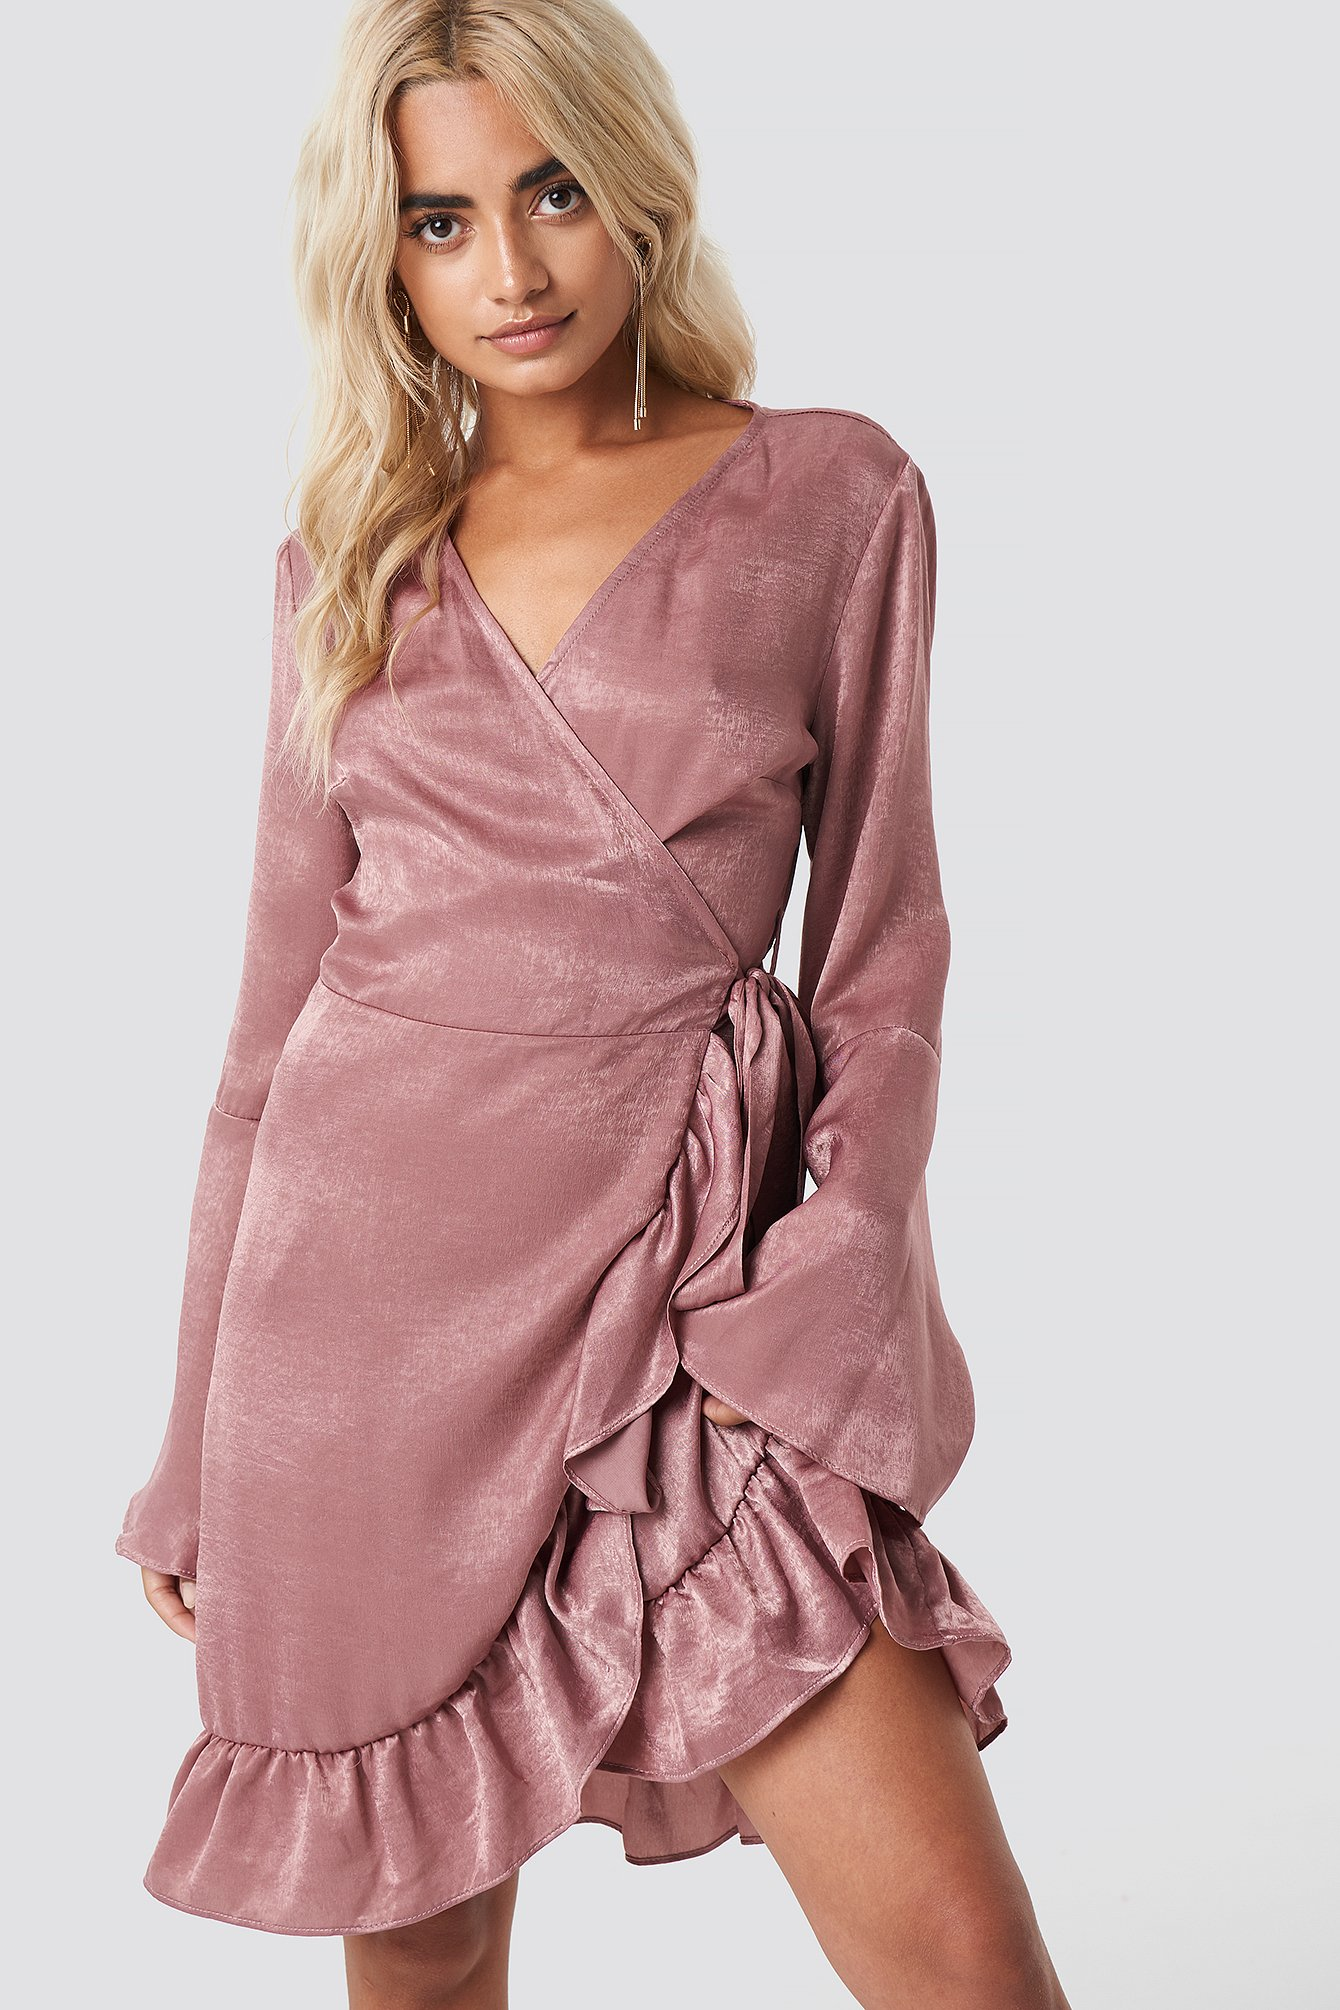 RUT & CIRCLE SOFIA WRAP FRILL DRESS - PINK